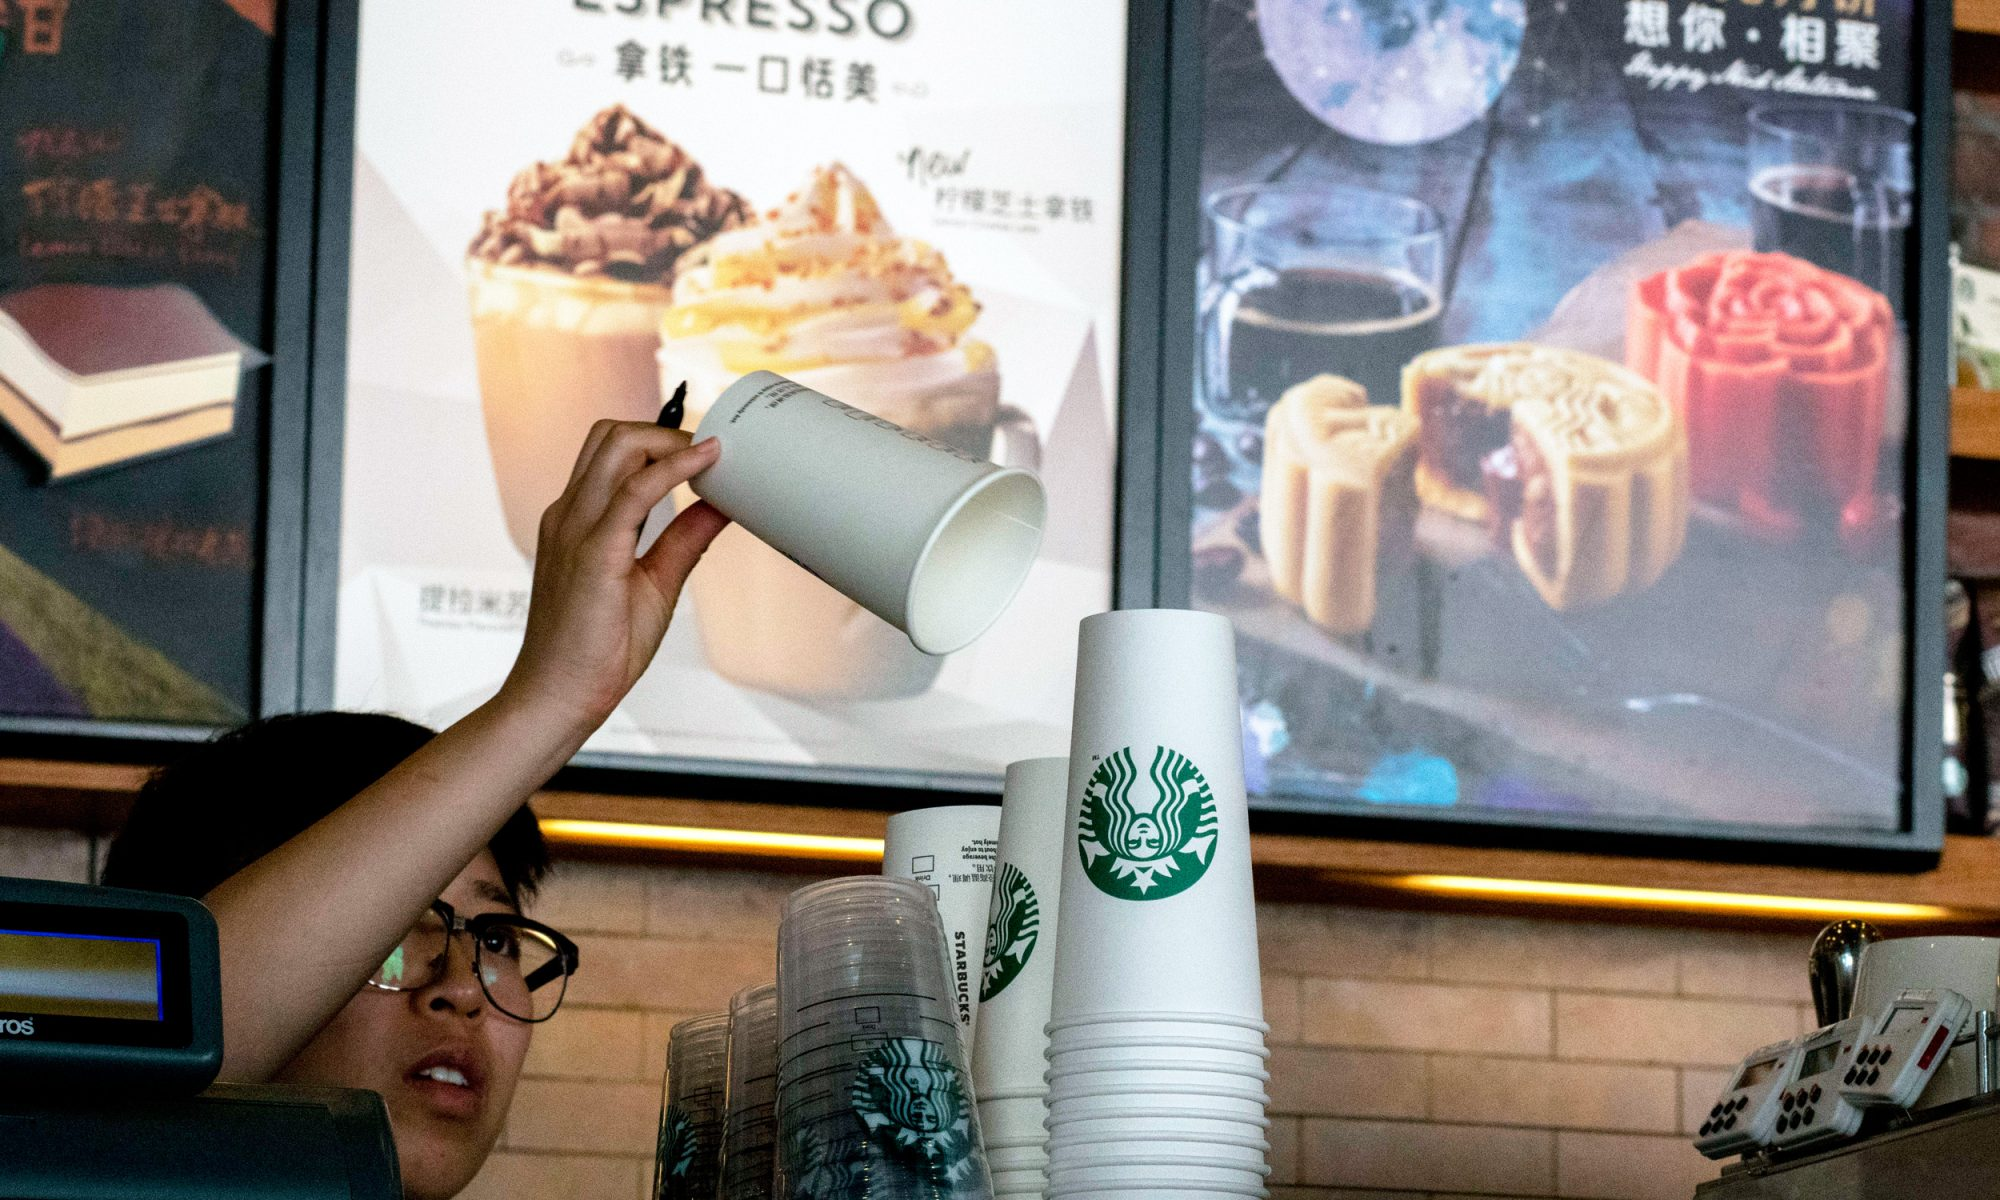 EC: Starbucks Is Loving China's Growing Taste for Coffee